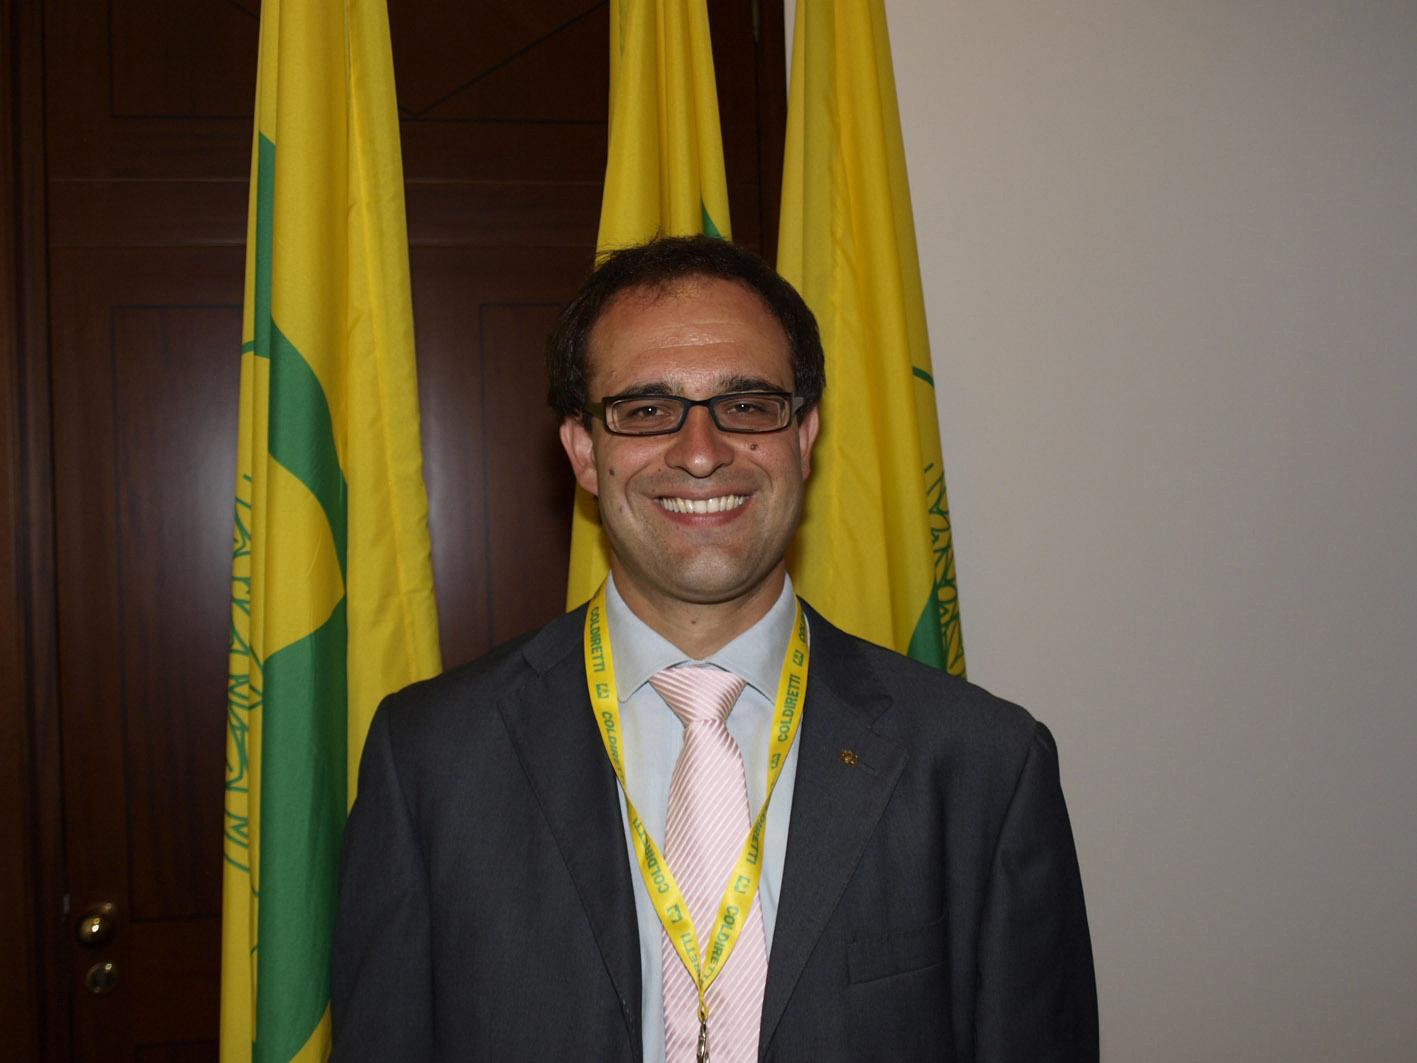 Roberto Moncalvo